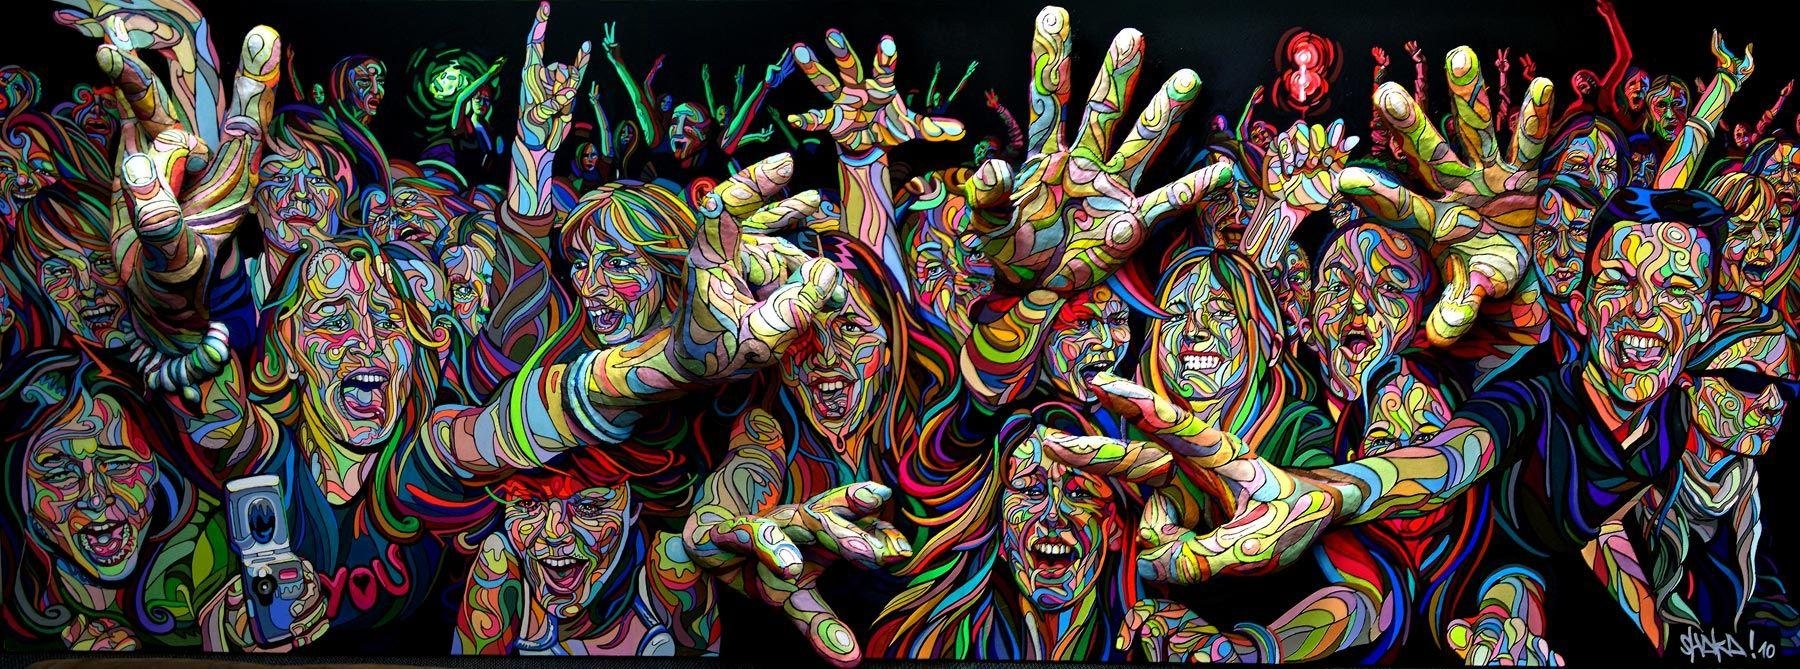 Стимуляция мозга заставила пациента с эпилепсией видеть лица и радугу